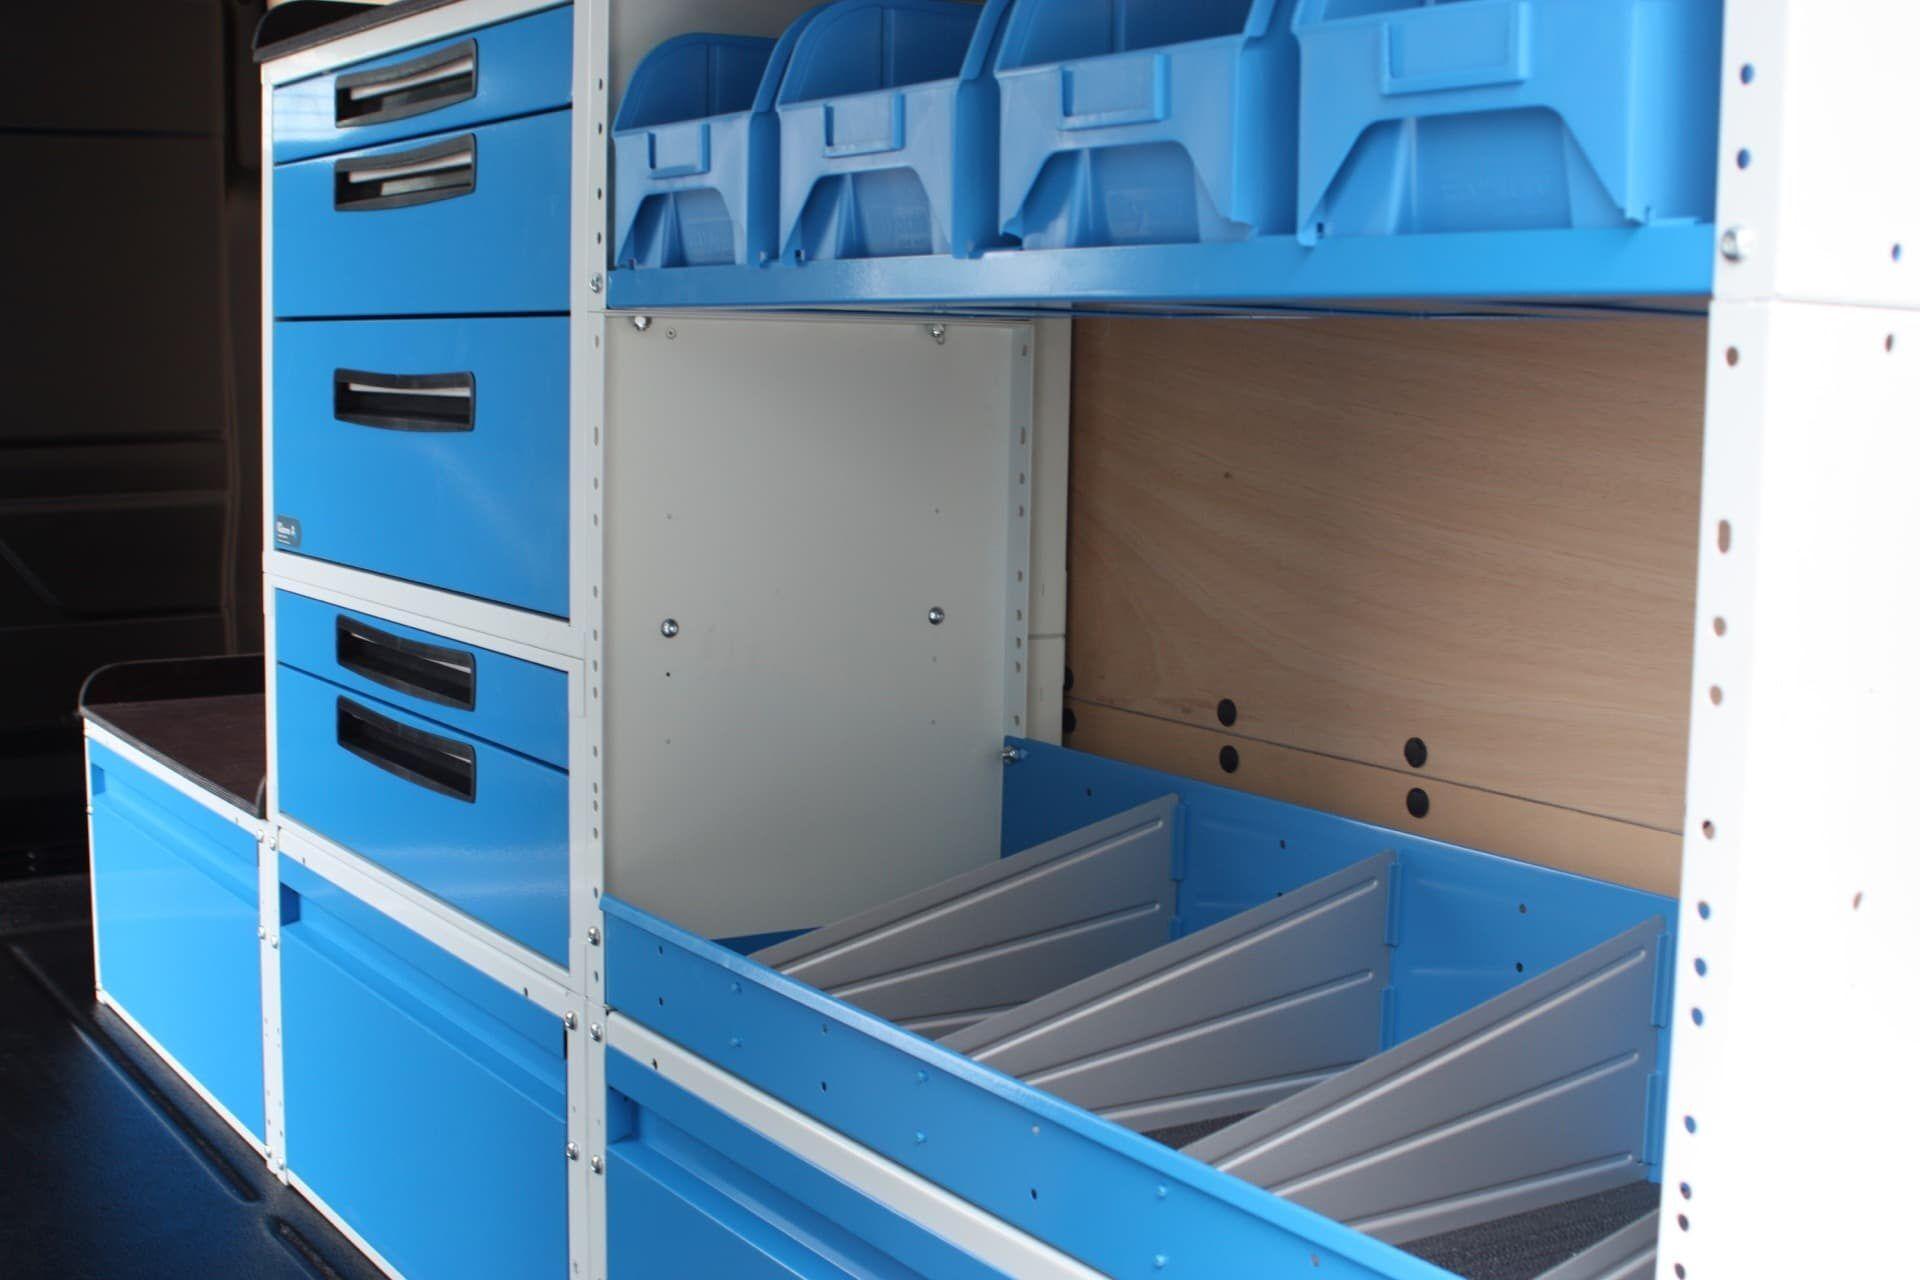 Modular storage system for van